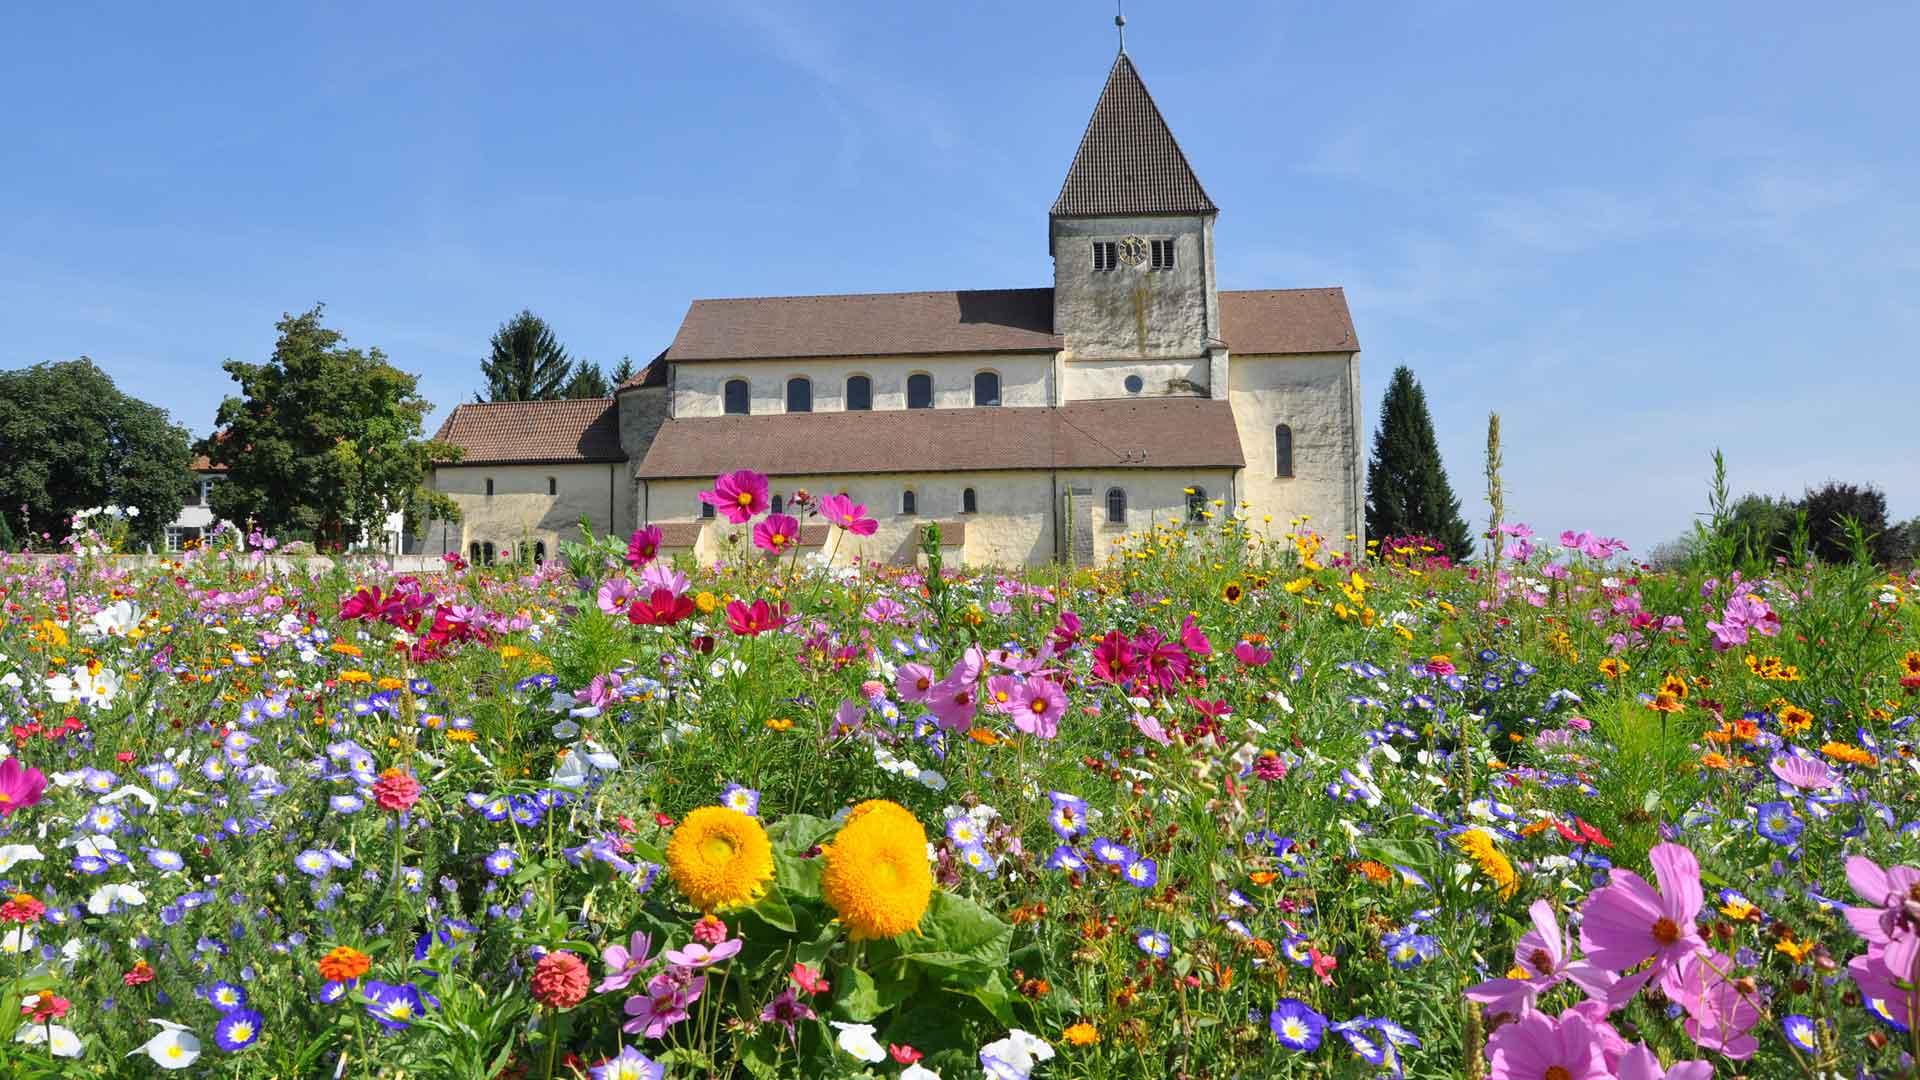 Het eiland Reichenau in de Bodensee is UNESCO werelderfgoed.